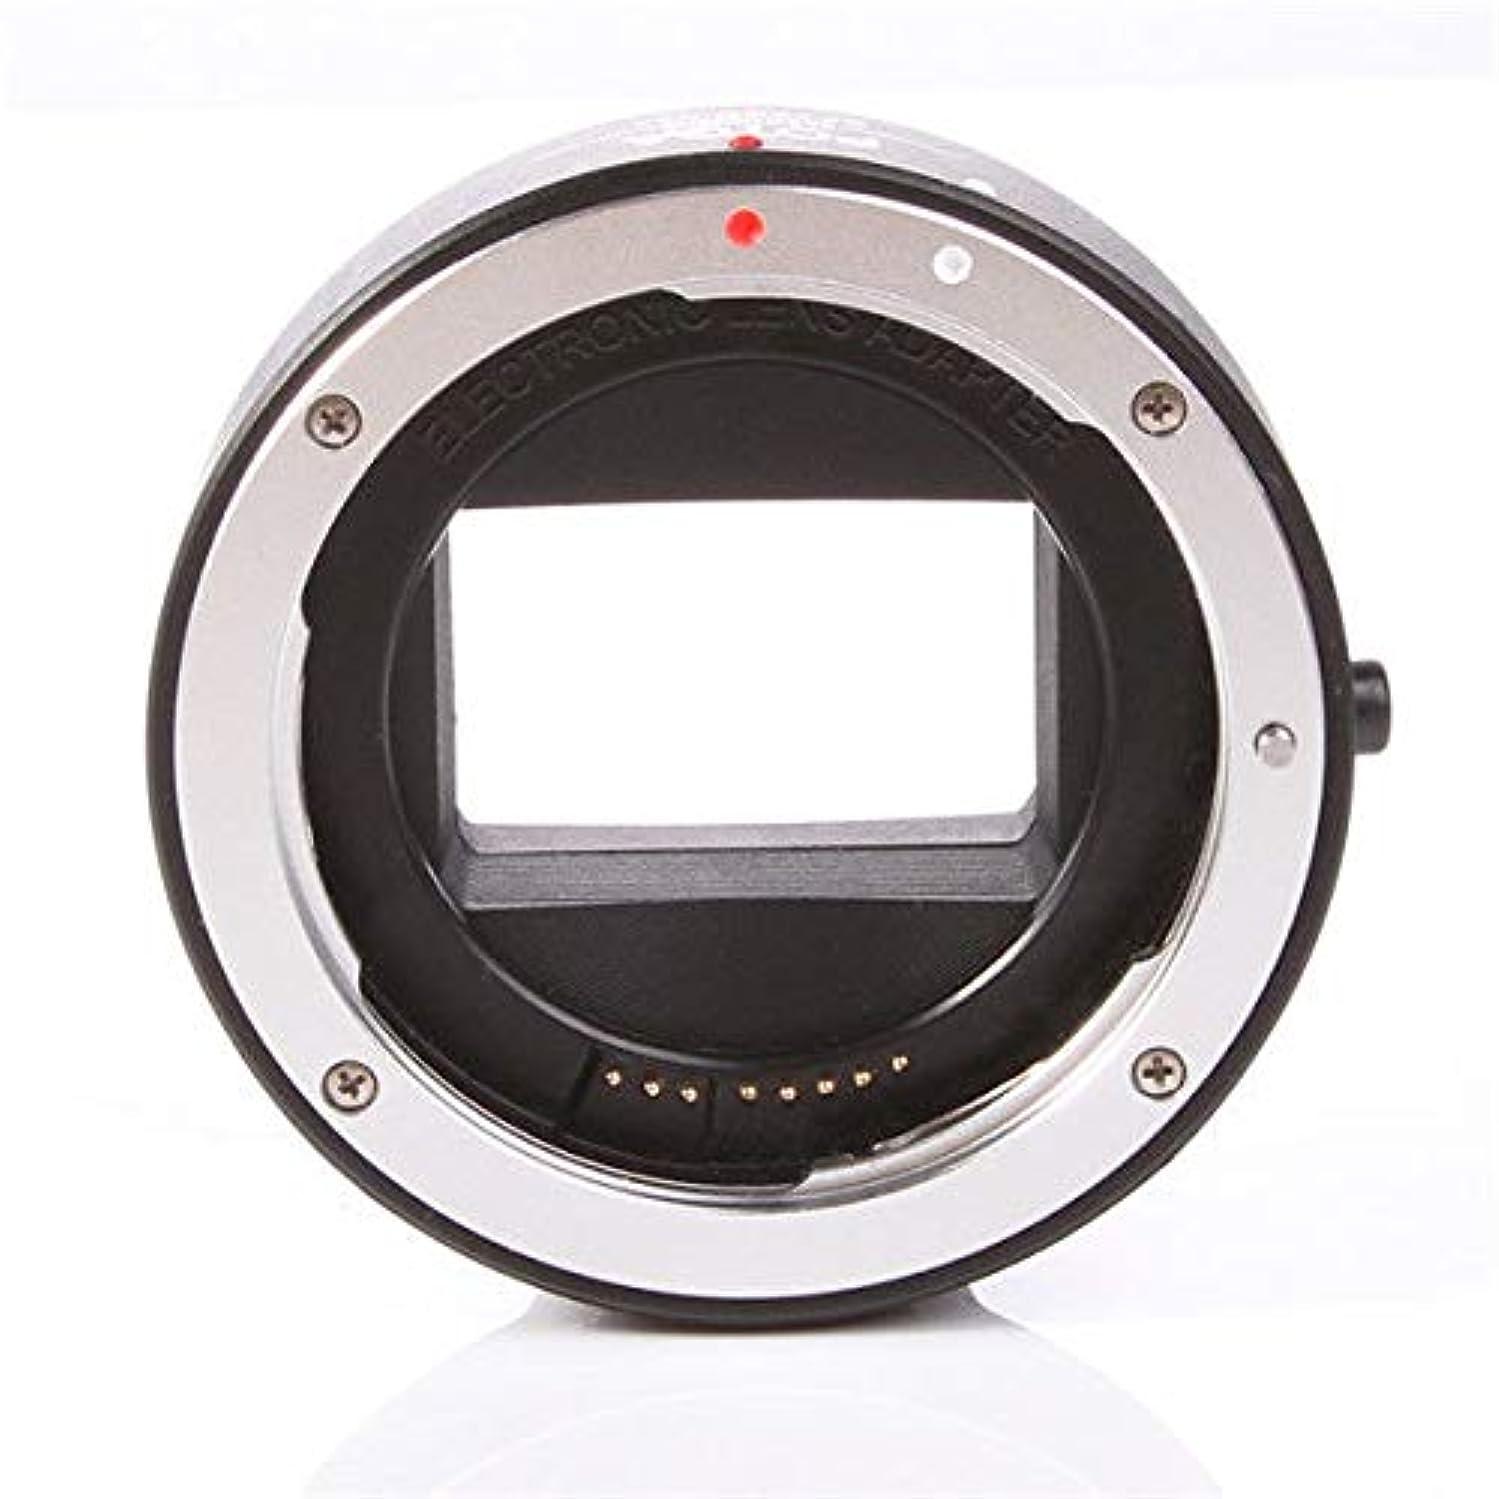 Fotga Newest Version Electronic Auto Focus EF-NEX EF-EMOUNT FX Lens Mount Adapter as Canon EF EF-S Lens to Sony E Mount NEX 3/3N/5N/5R/7/A7 A7R VG10 VG20 Full Frame